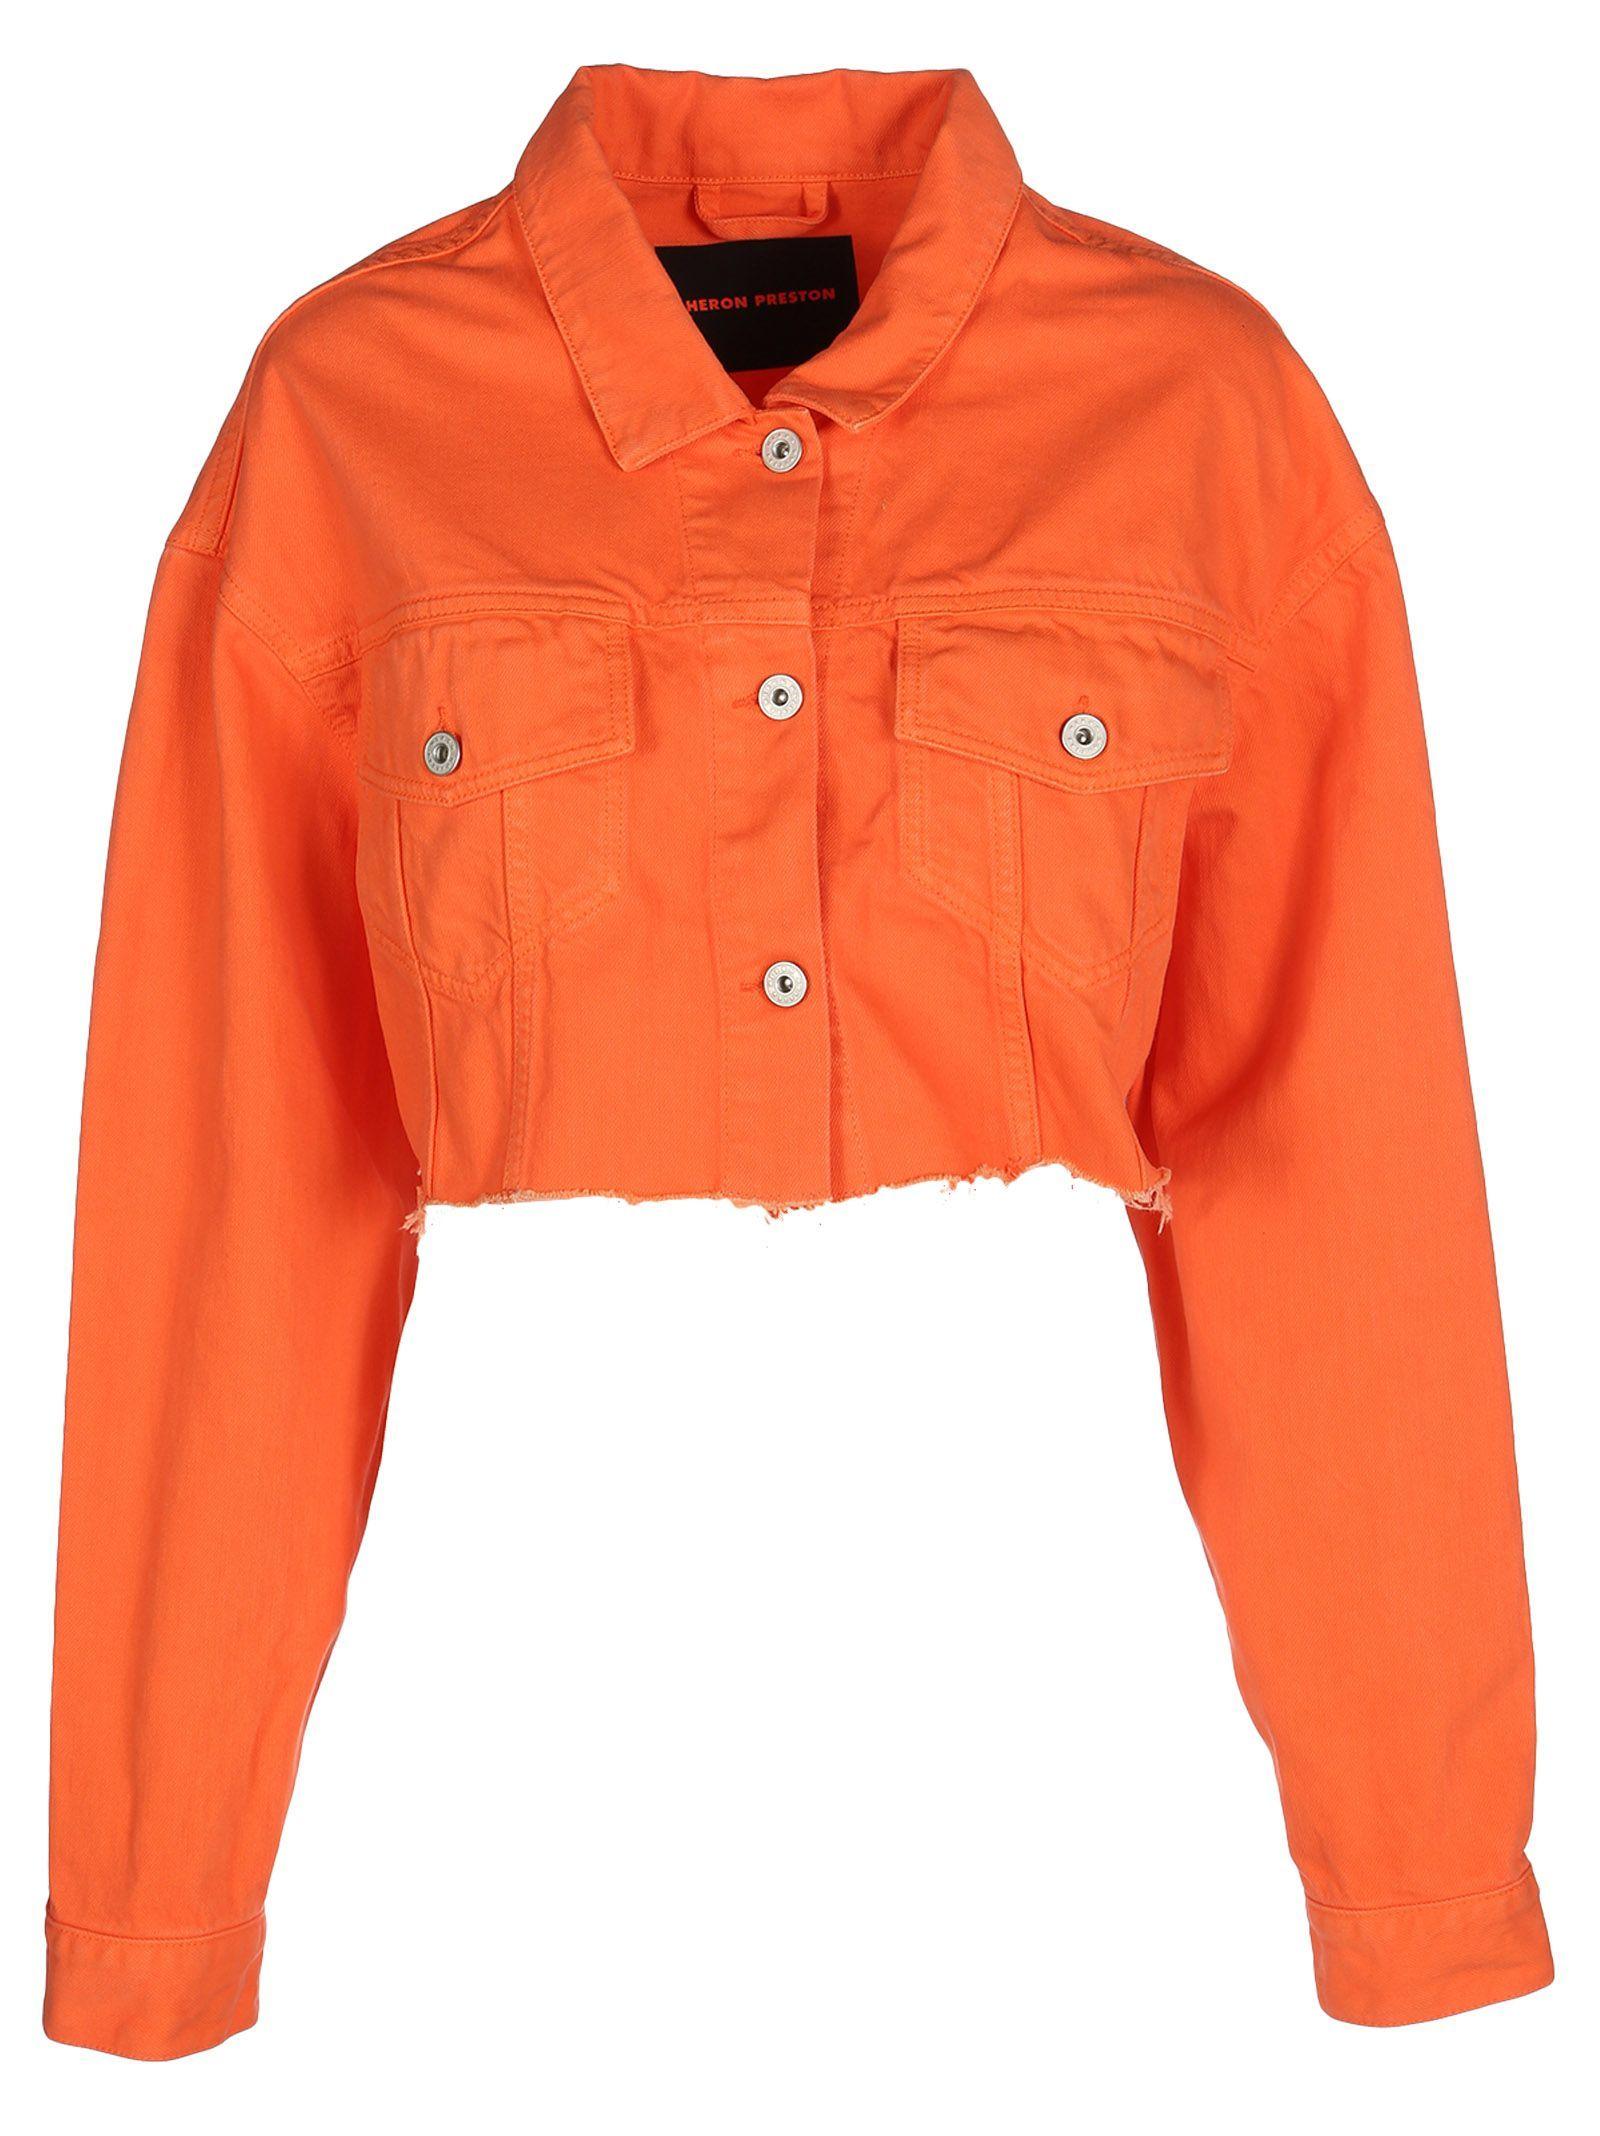 Heron Preston Heron Preston Cropped Denim Jacket Heronpreston Cloth Cropped Denim Jacket Cropped Denim Jackets [ 2136 x 1600 Pixel ]